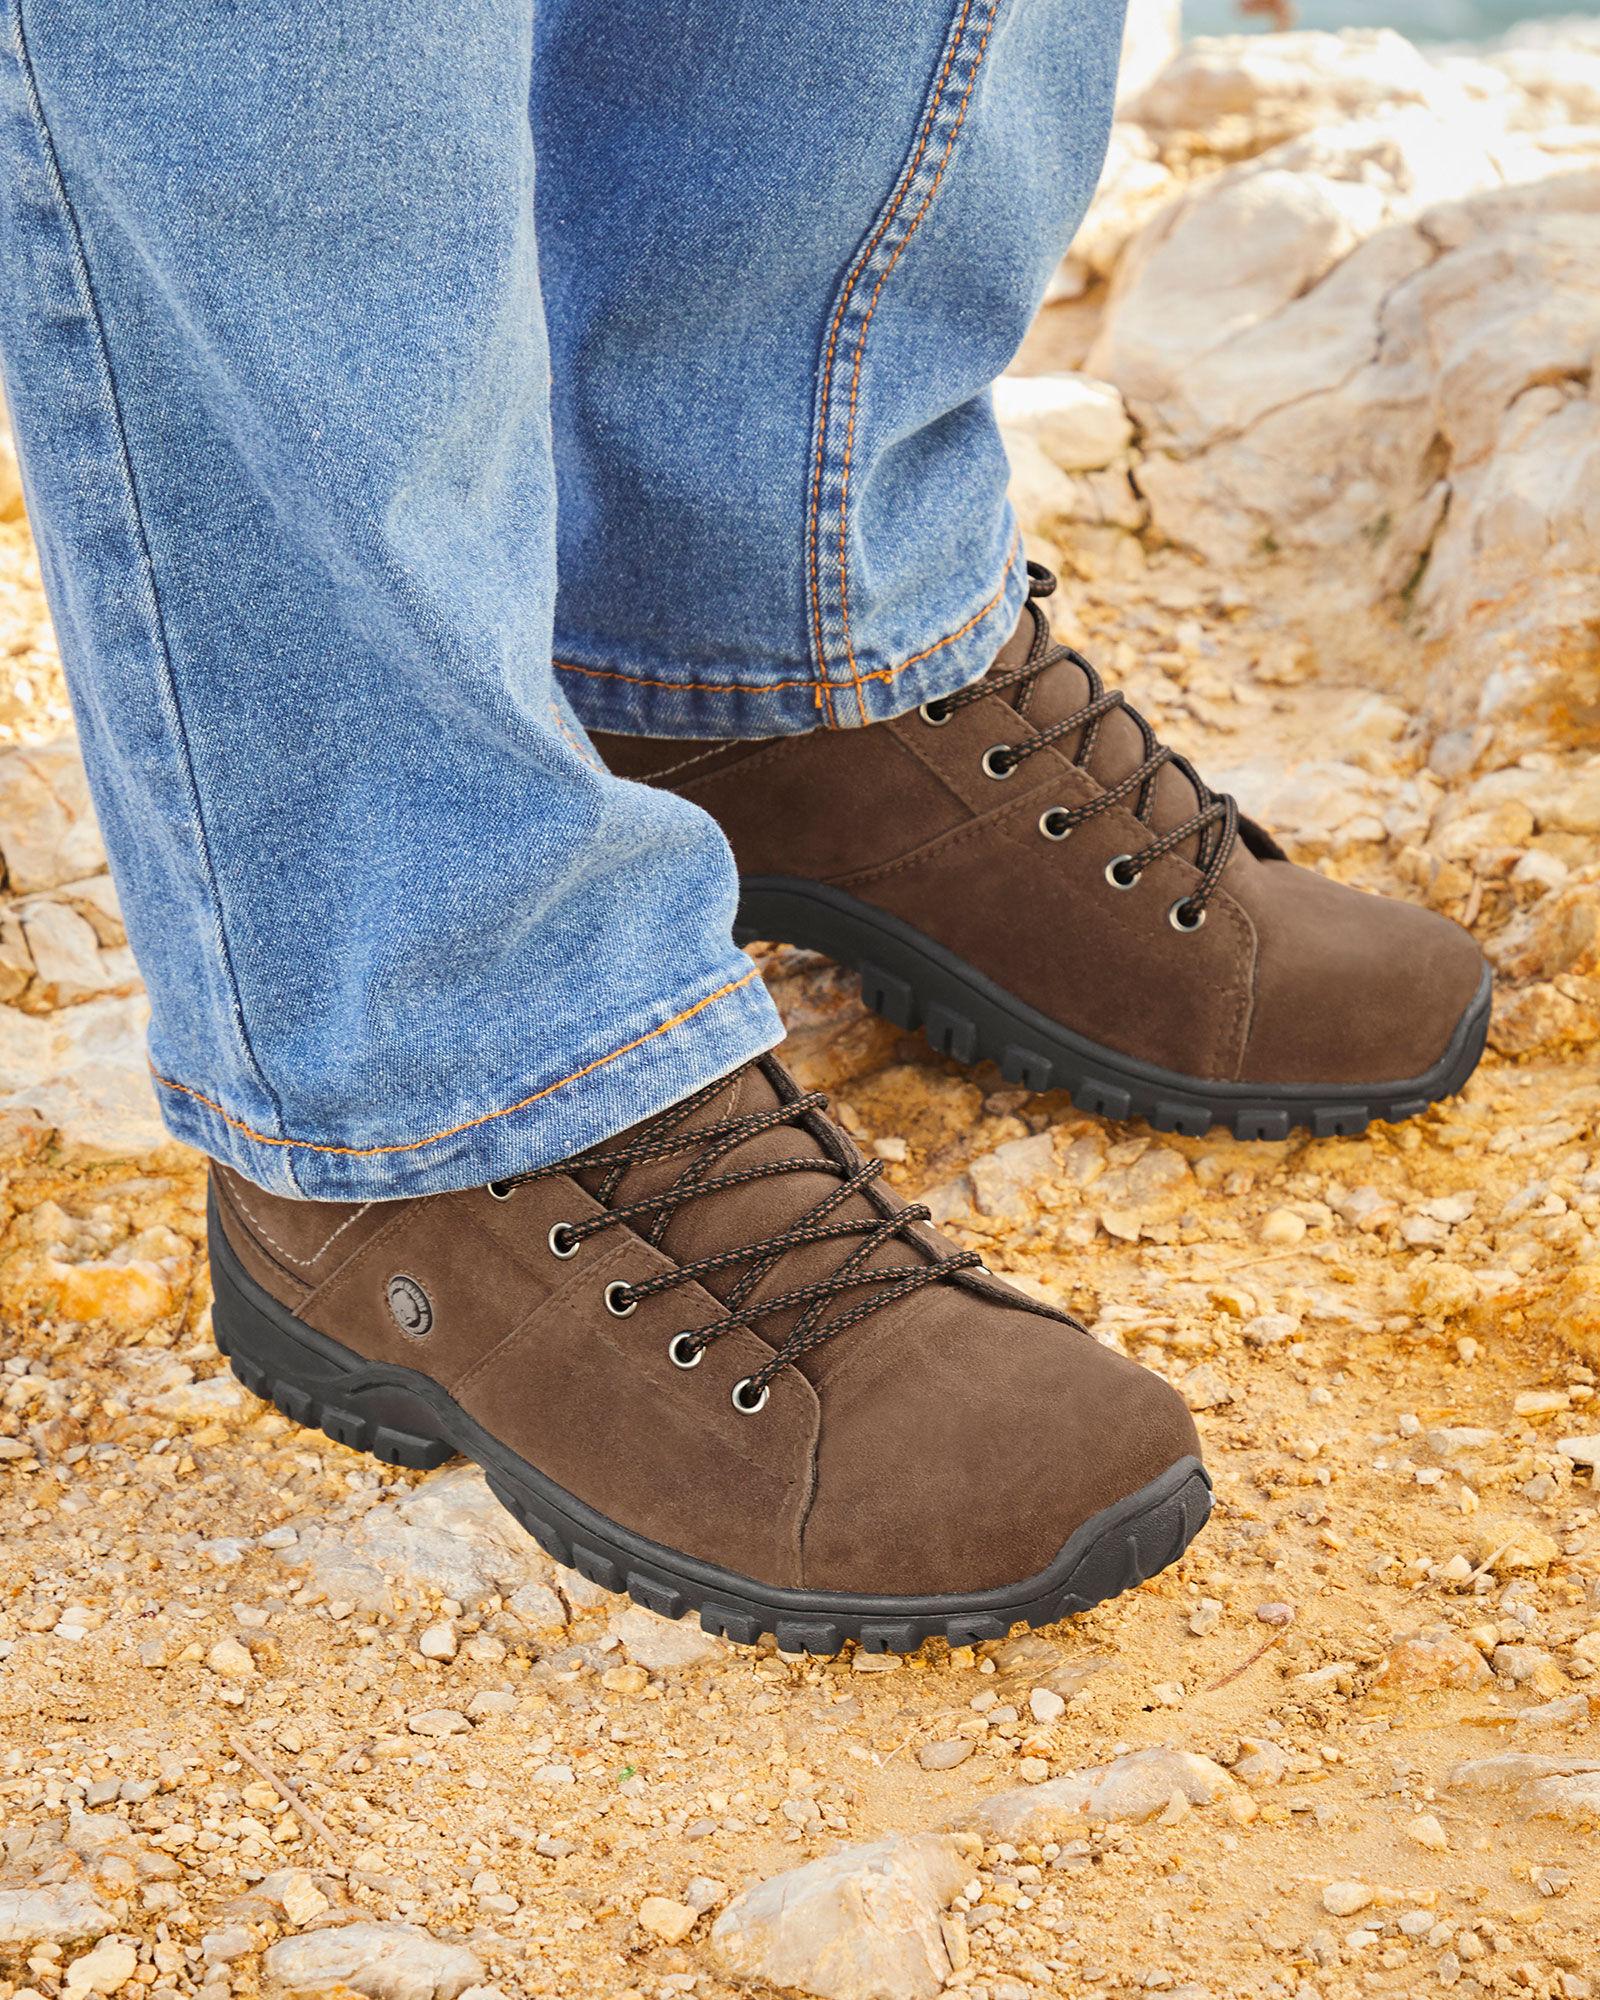 Women's Walking Shoes   Cotton Traders